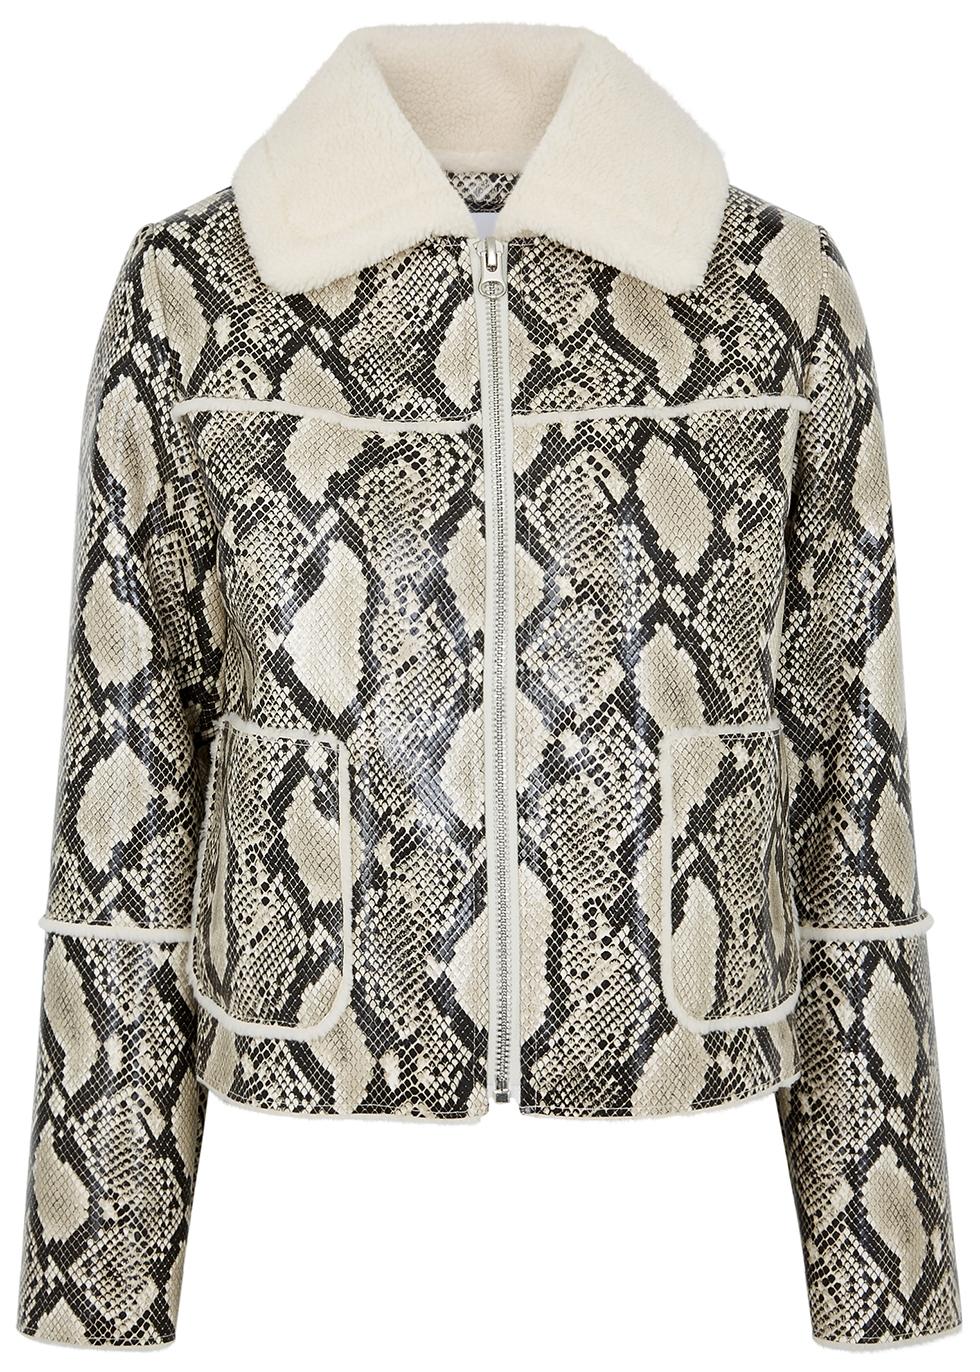 Maj python-effect faux leather jacket